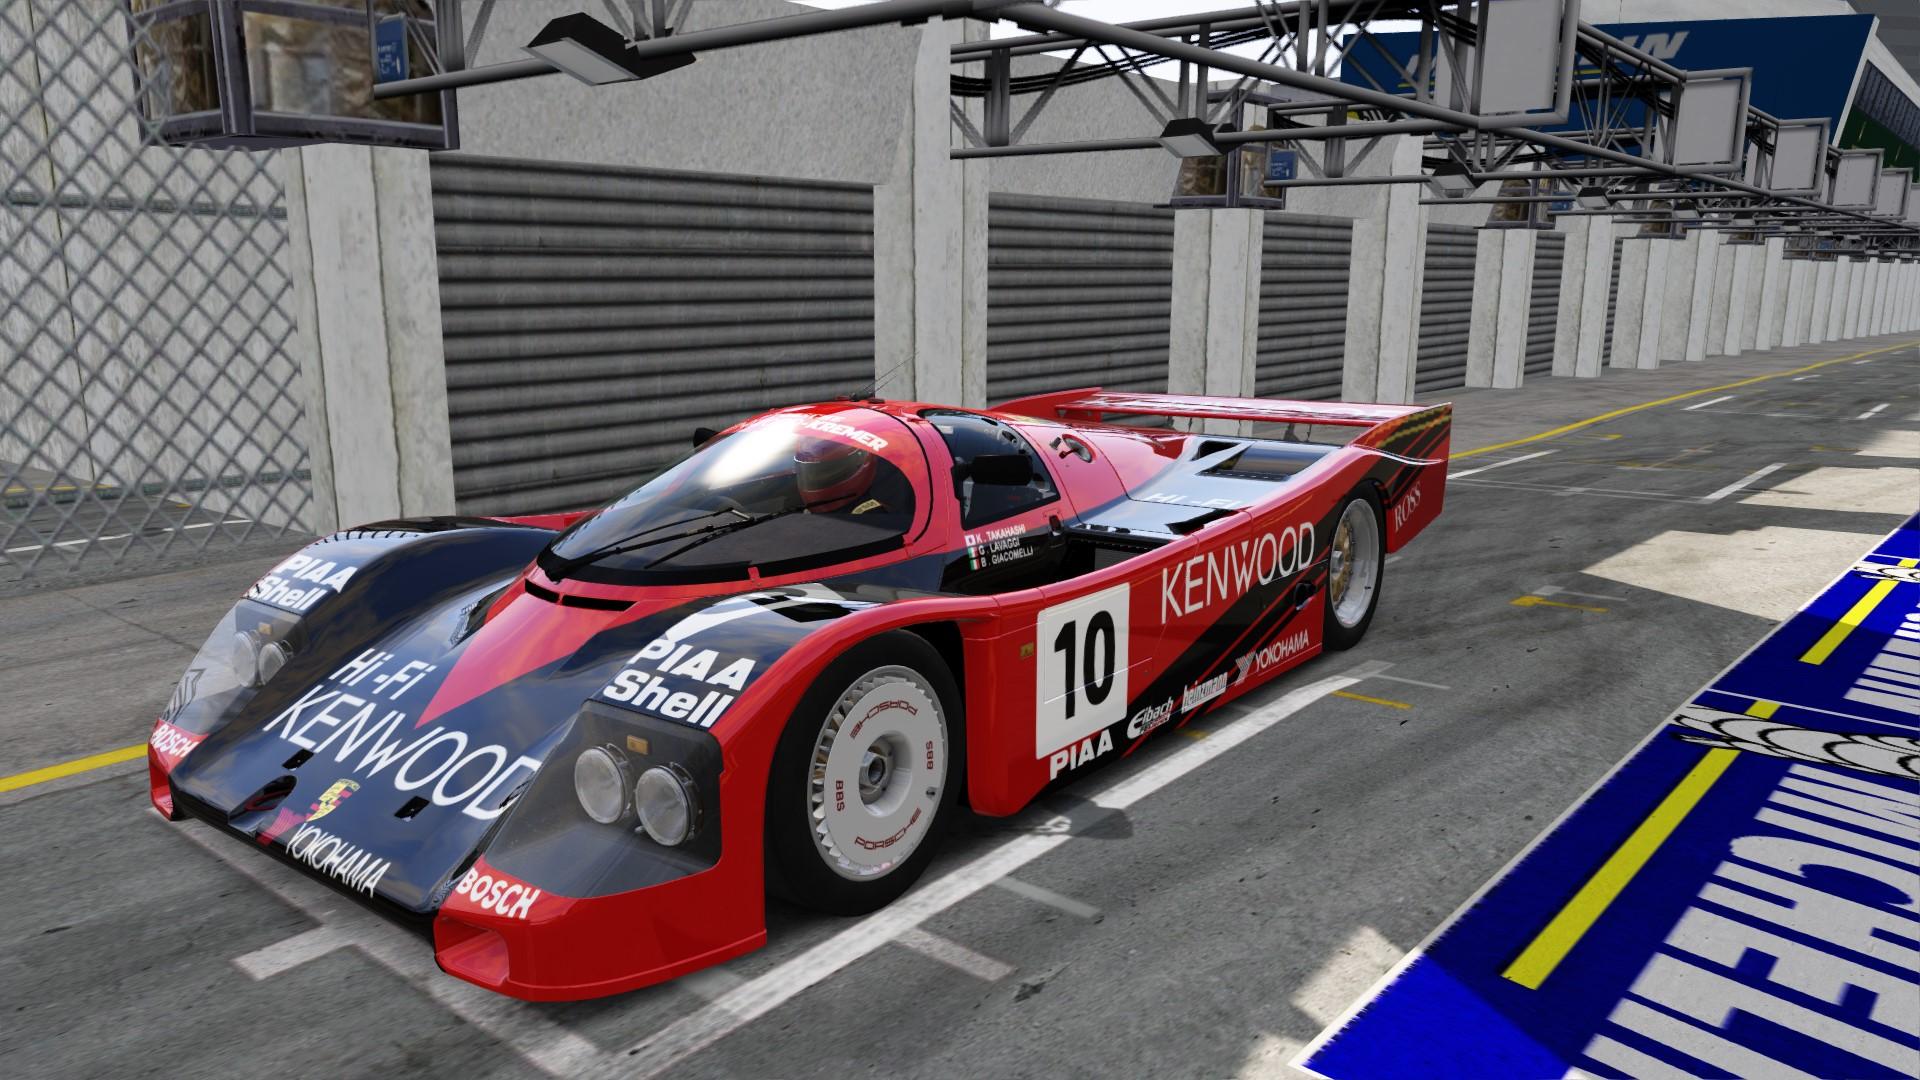 Hasegawa 1/24 Kenwood Kremer Porsche 962C # 20287